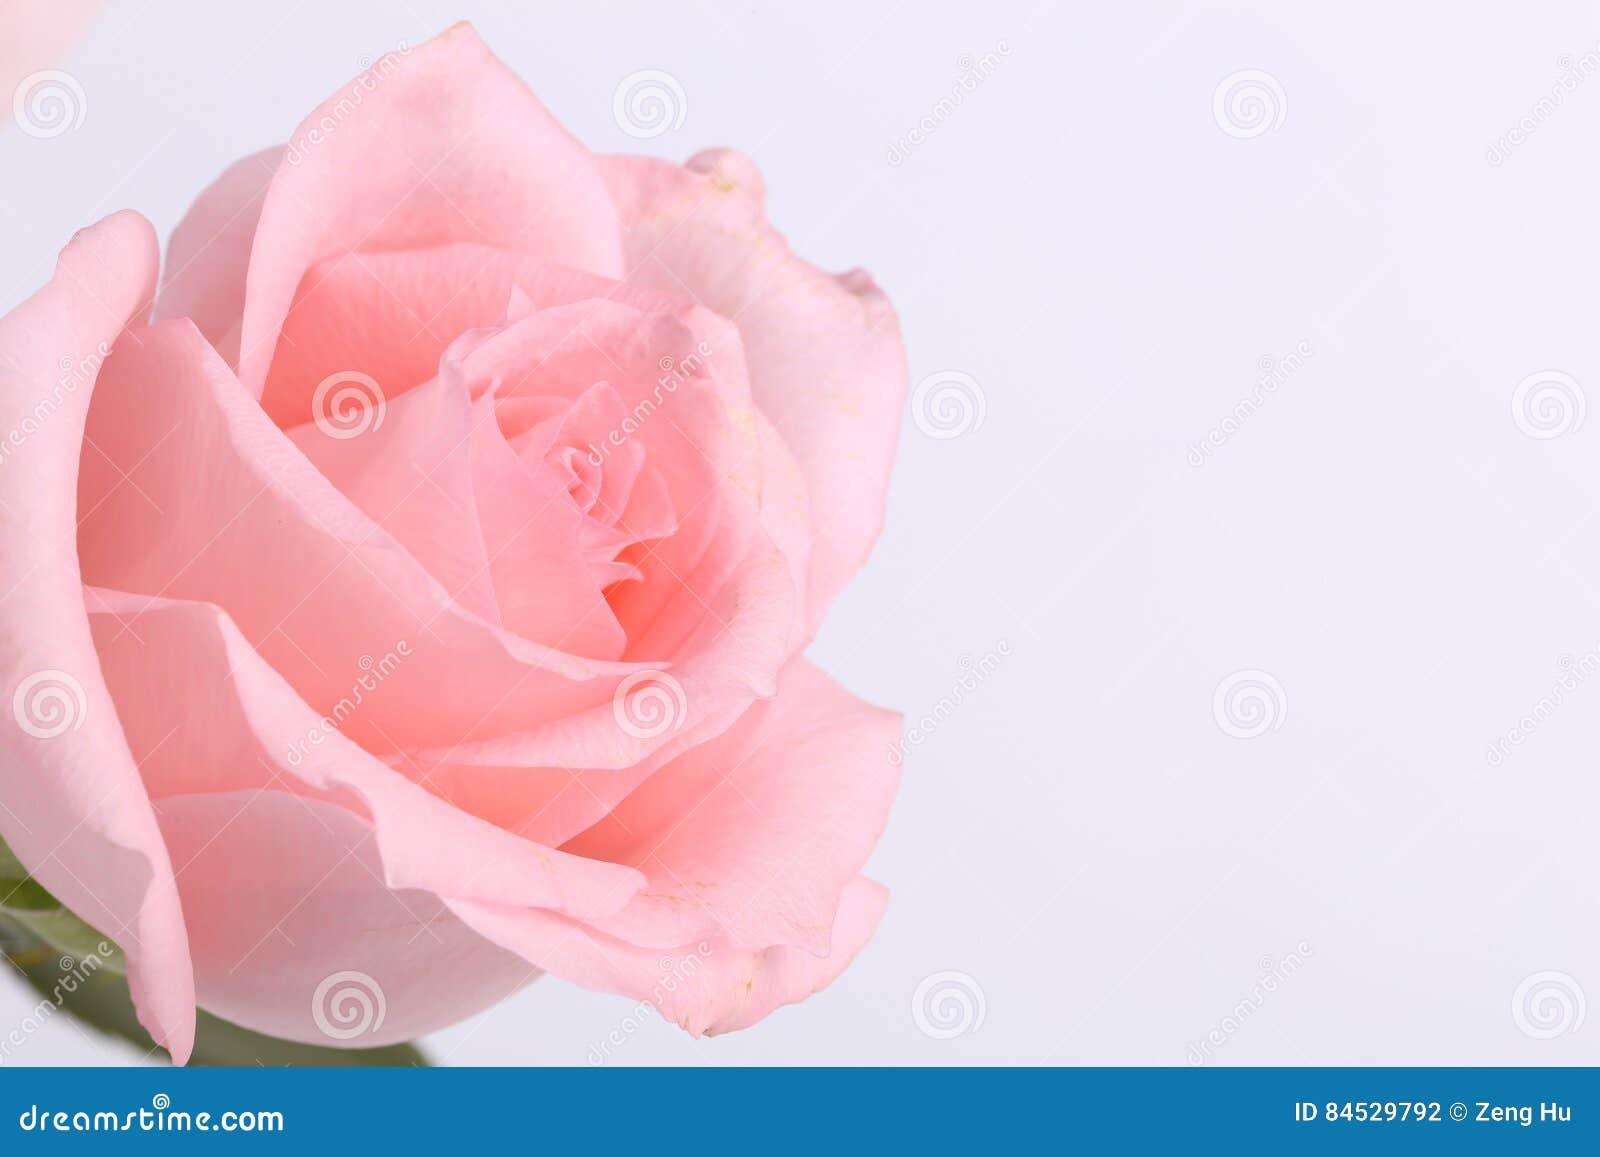 One pink rose closeup stock photo image of green life 84529792 single pink rose flower closeup mightylinksfo